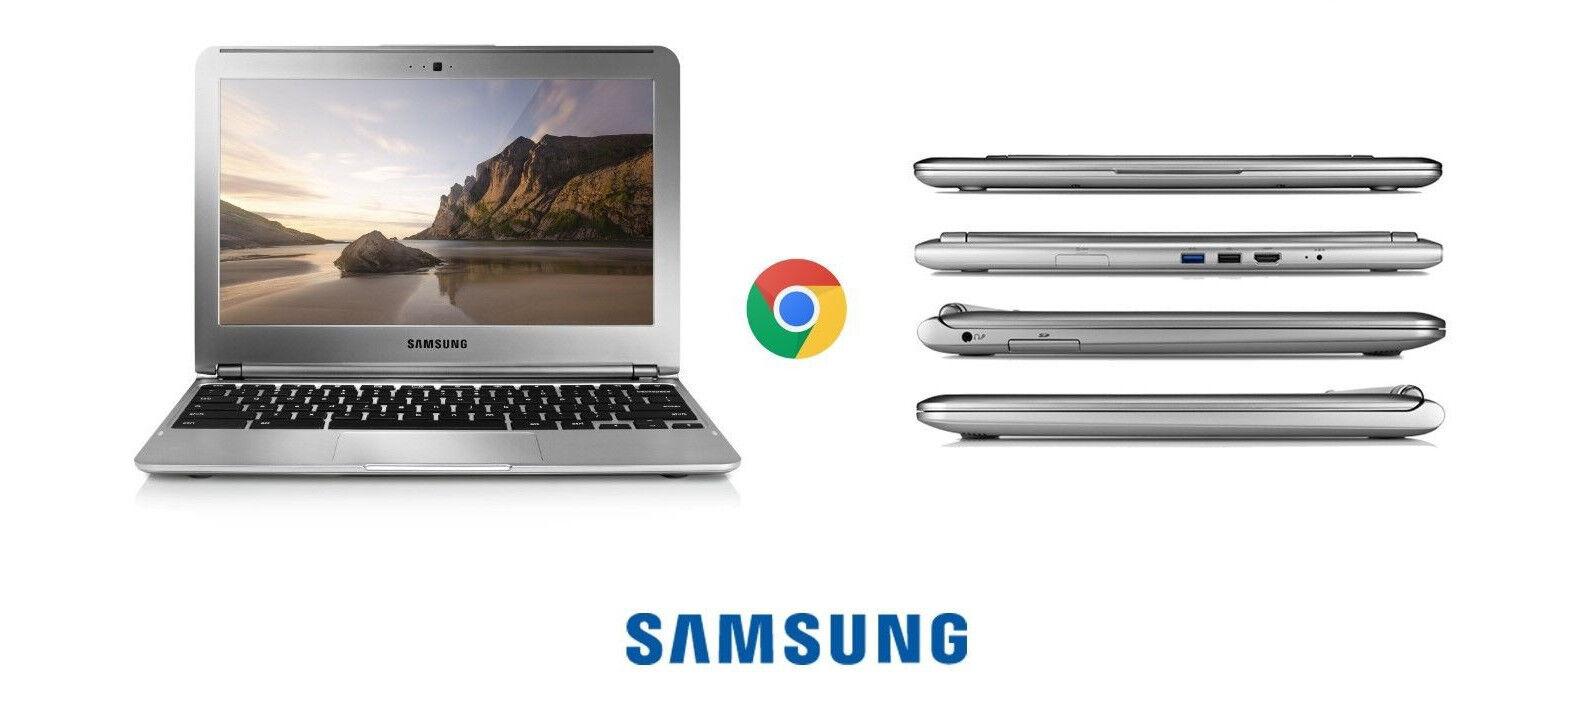 LOT OF 4 pcs SAMSUNG Google Chromebook 11.6 Laptop 1.7GHz XE303C12 screen issues